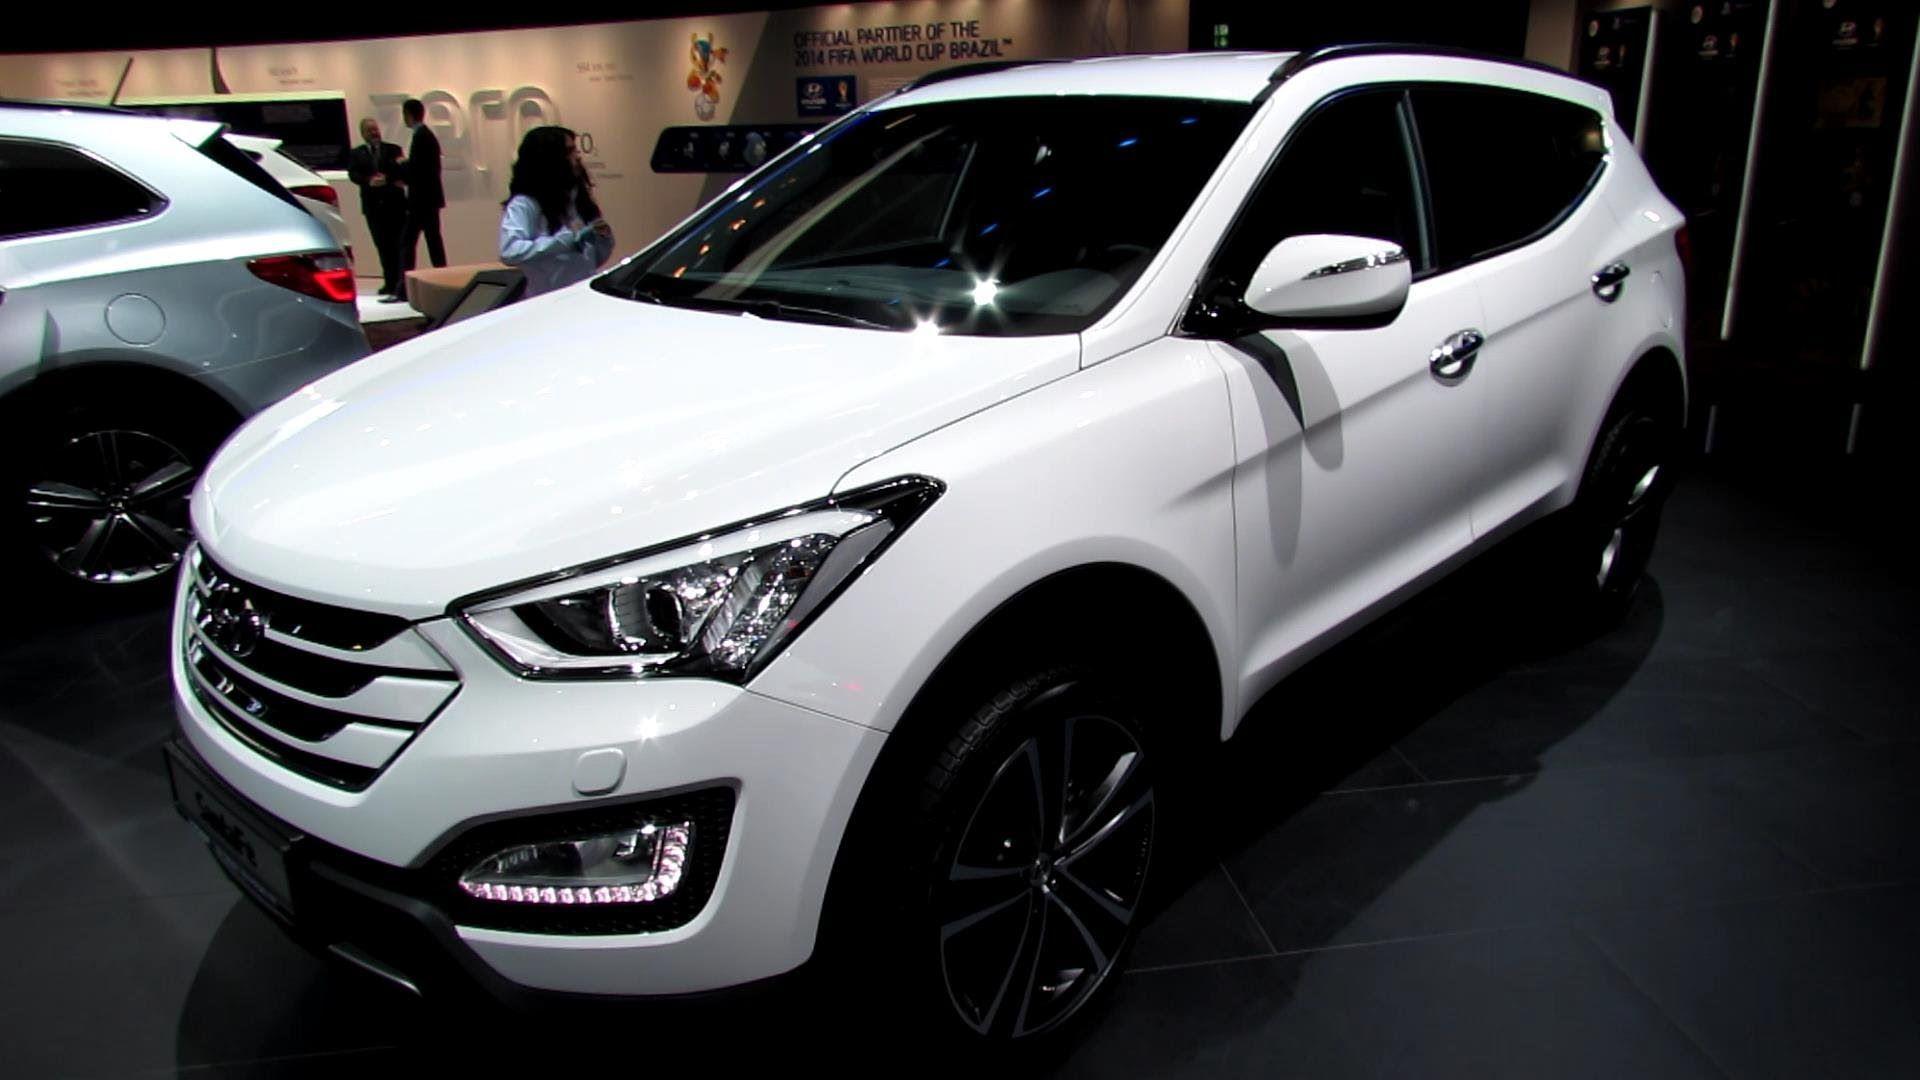 2016 Hyundai Santa Fe Suv High Resolution Wallpaper